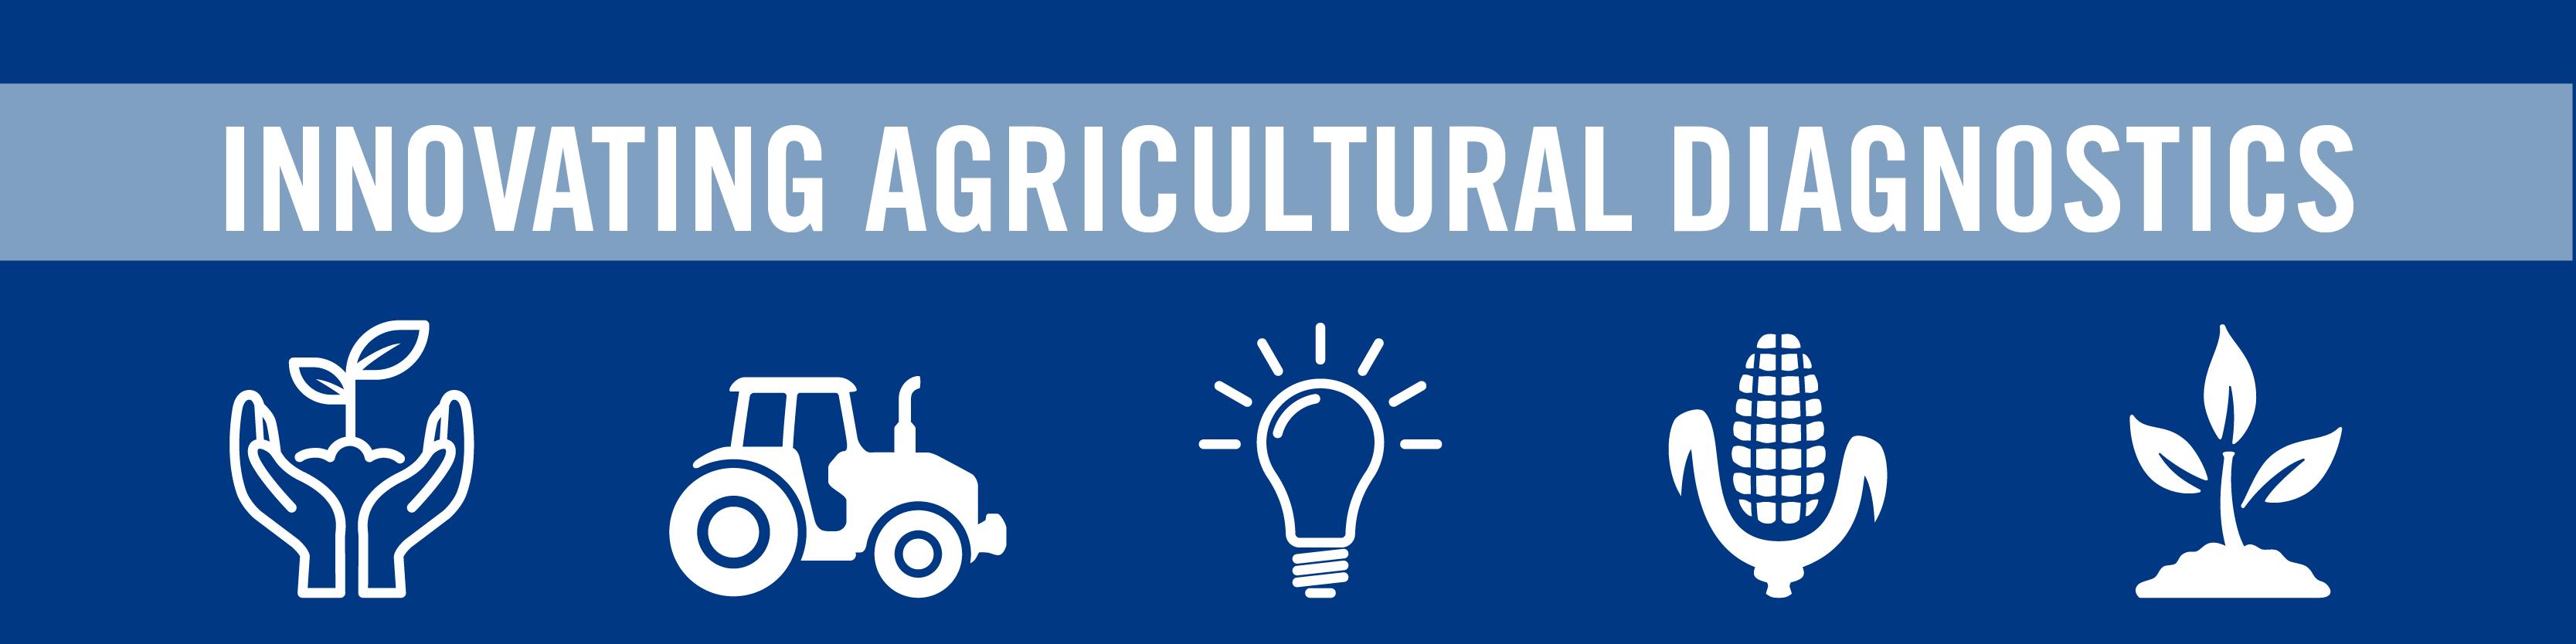 Innovating Agricultural Diagnostics